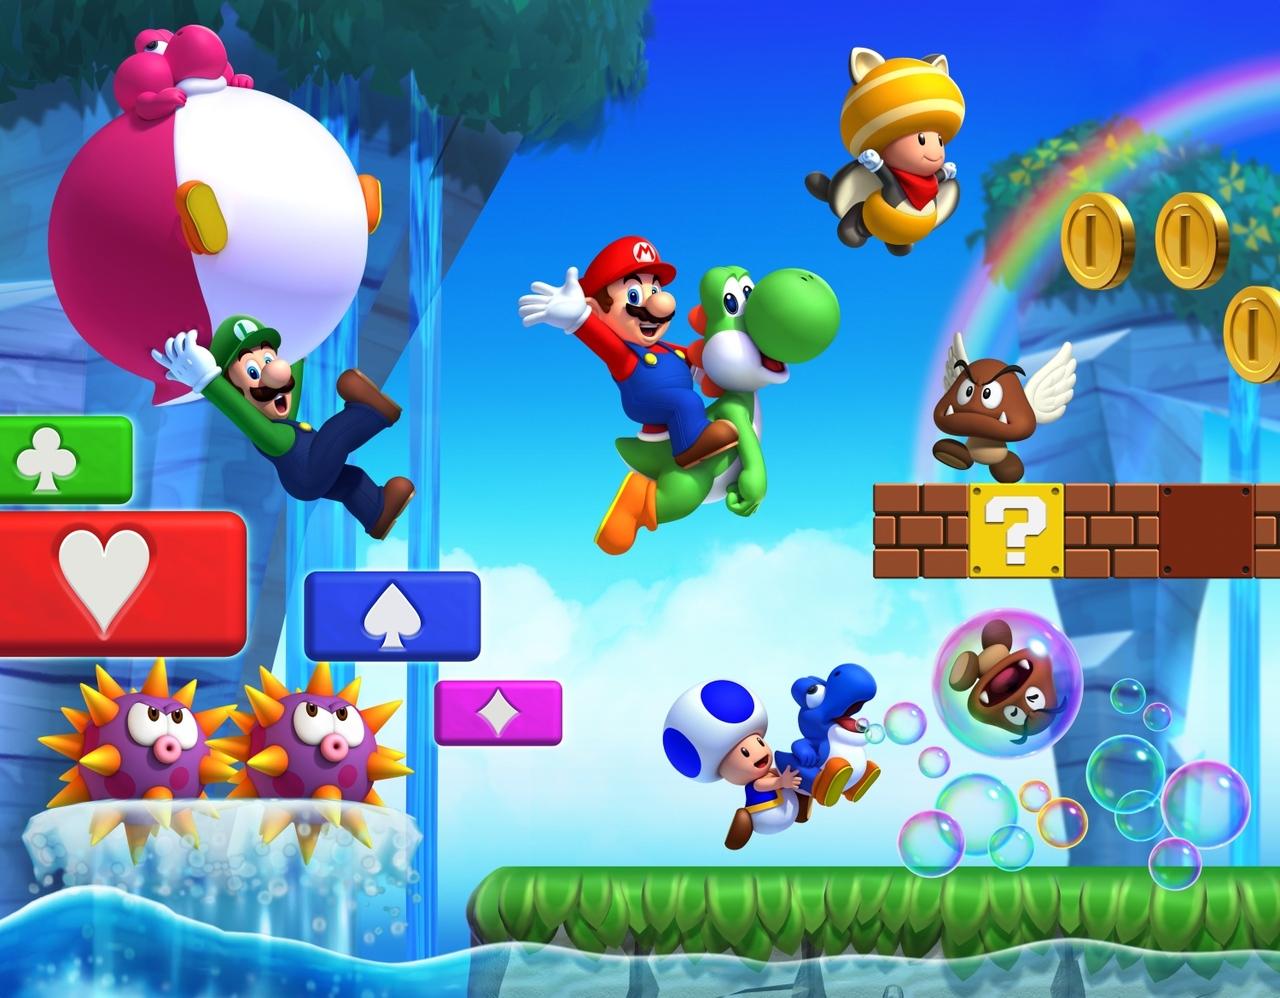 jeuxvideo.com New Super Mario Bros. U - Wii U Image 26 sur 266